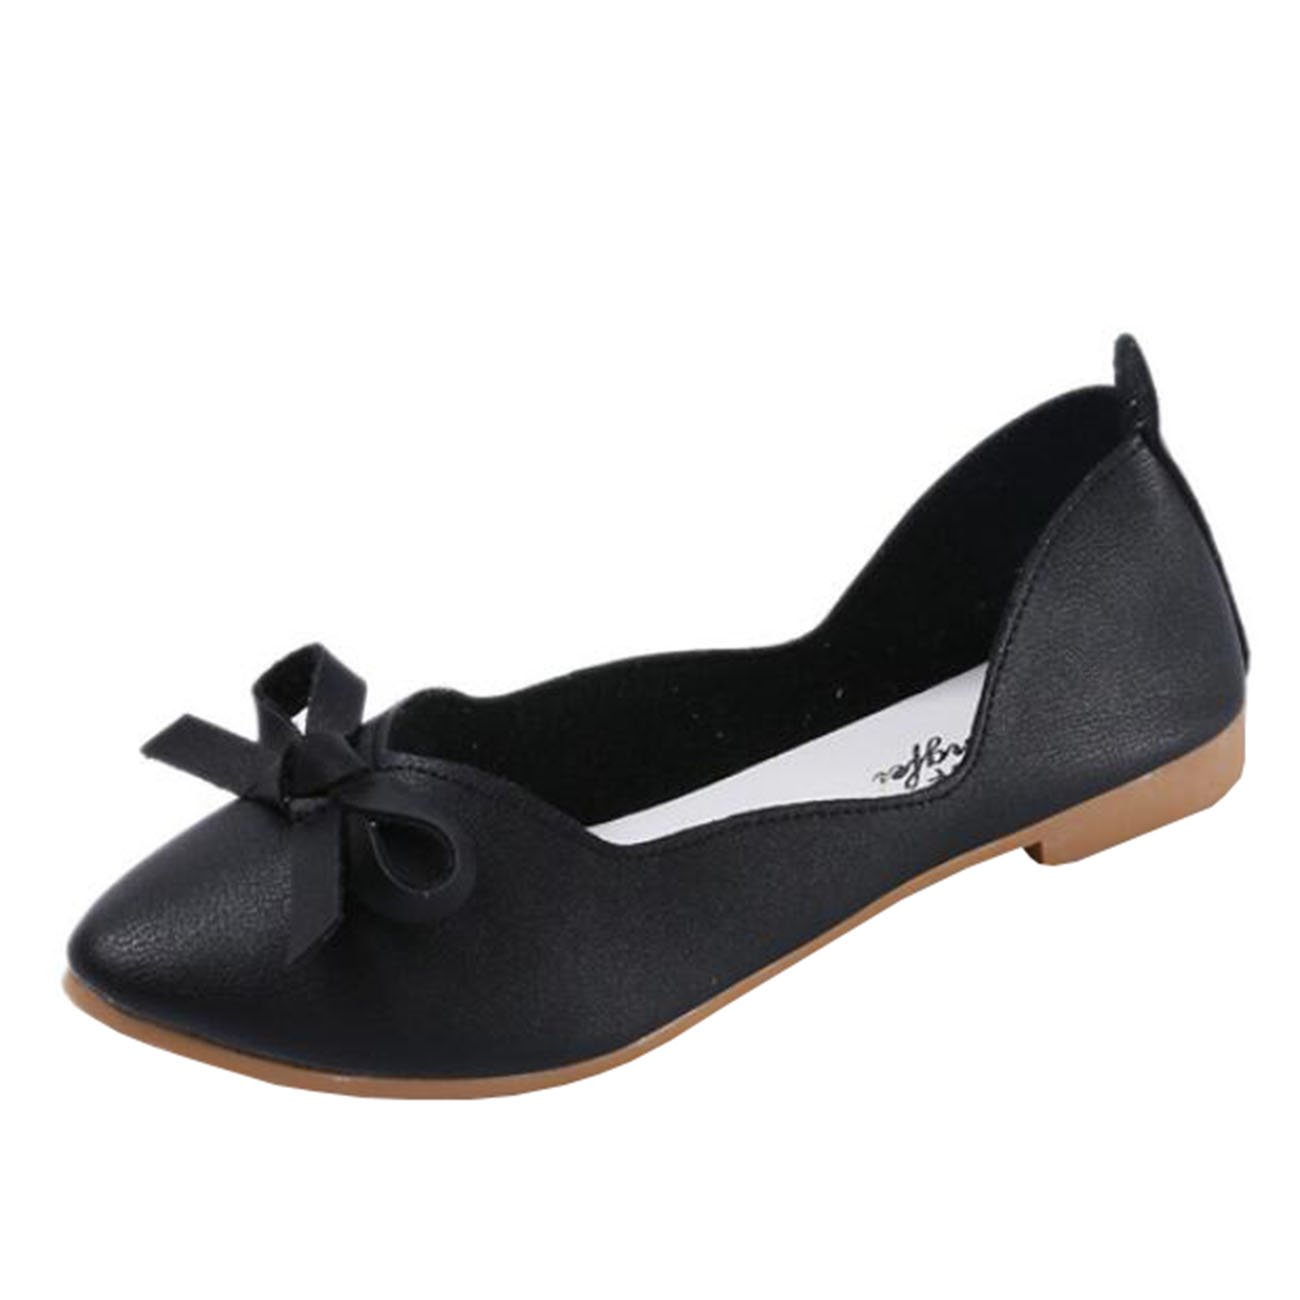 Mashiaoyi Womens Square-Toe Flat Slip-on Metal Ballet Flats